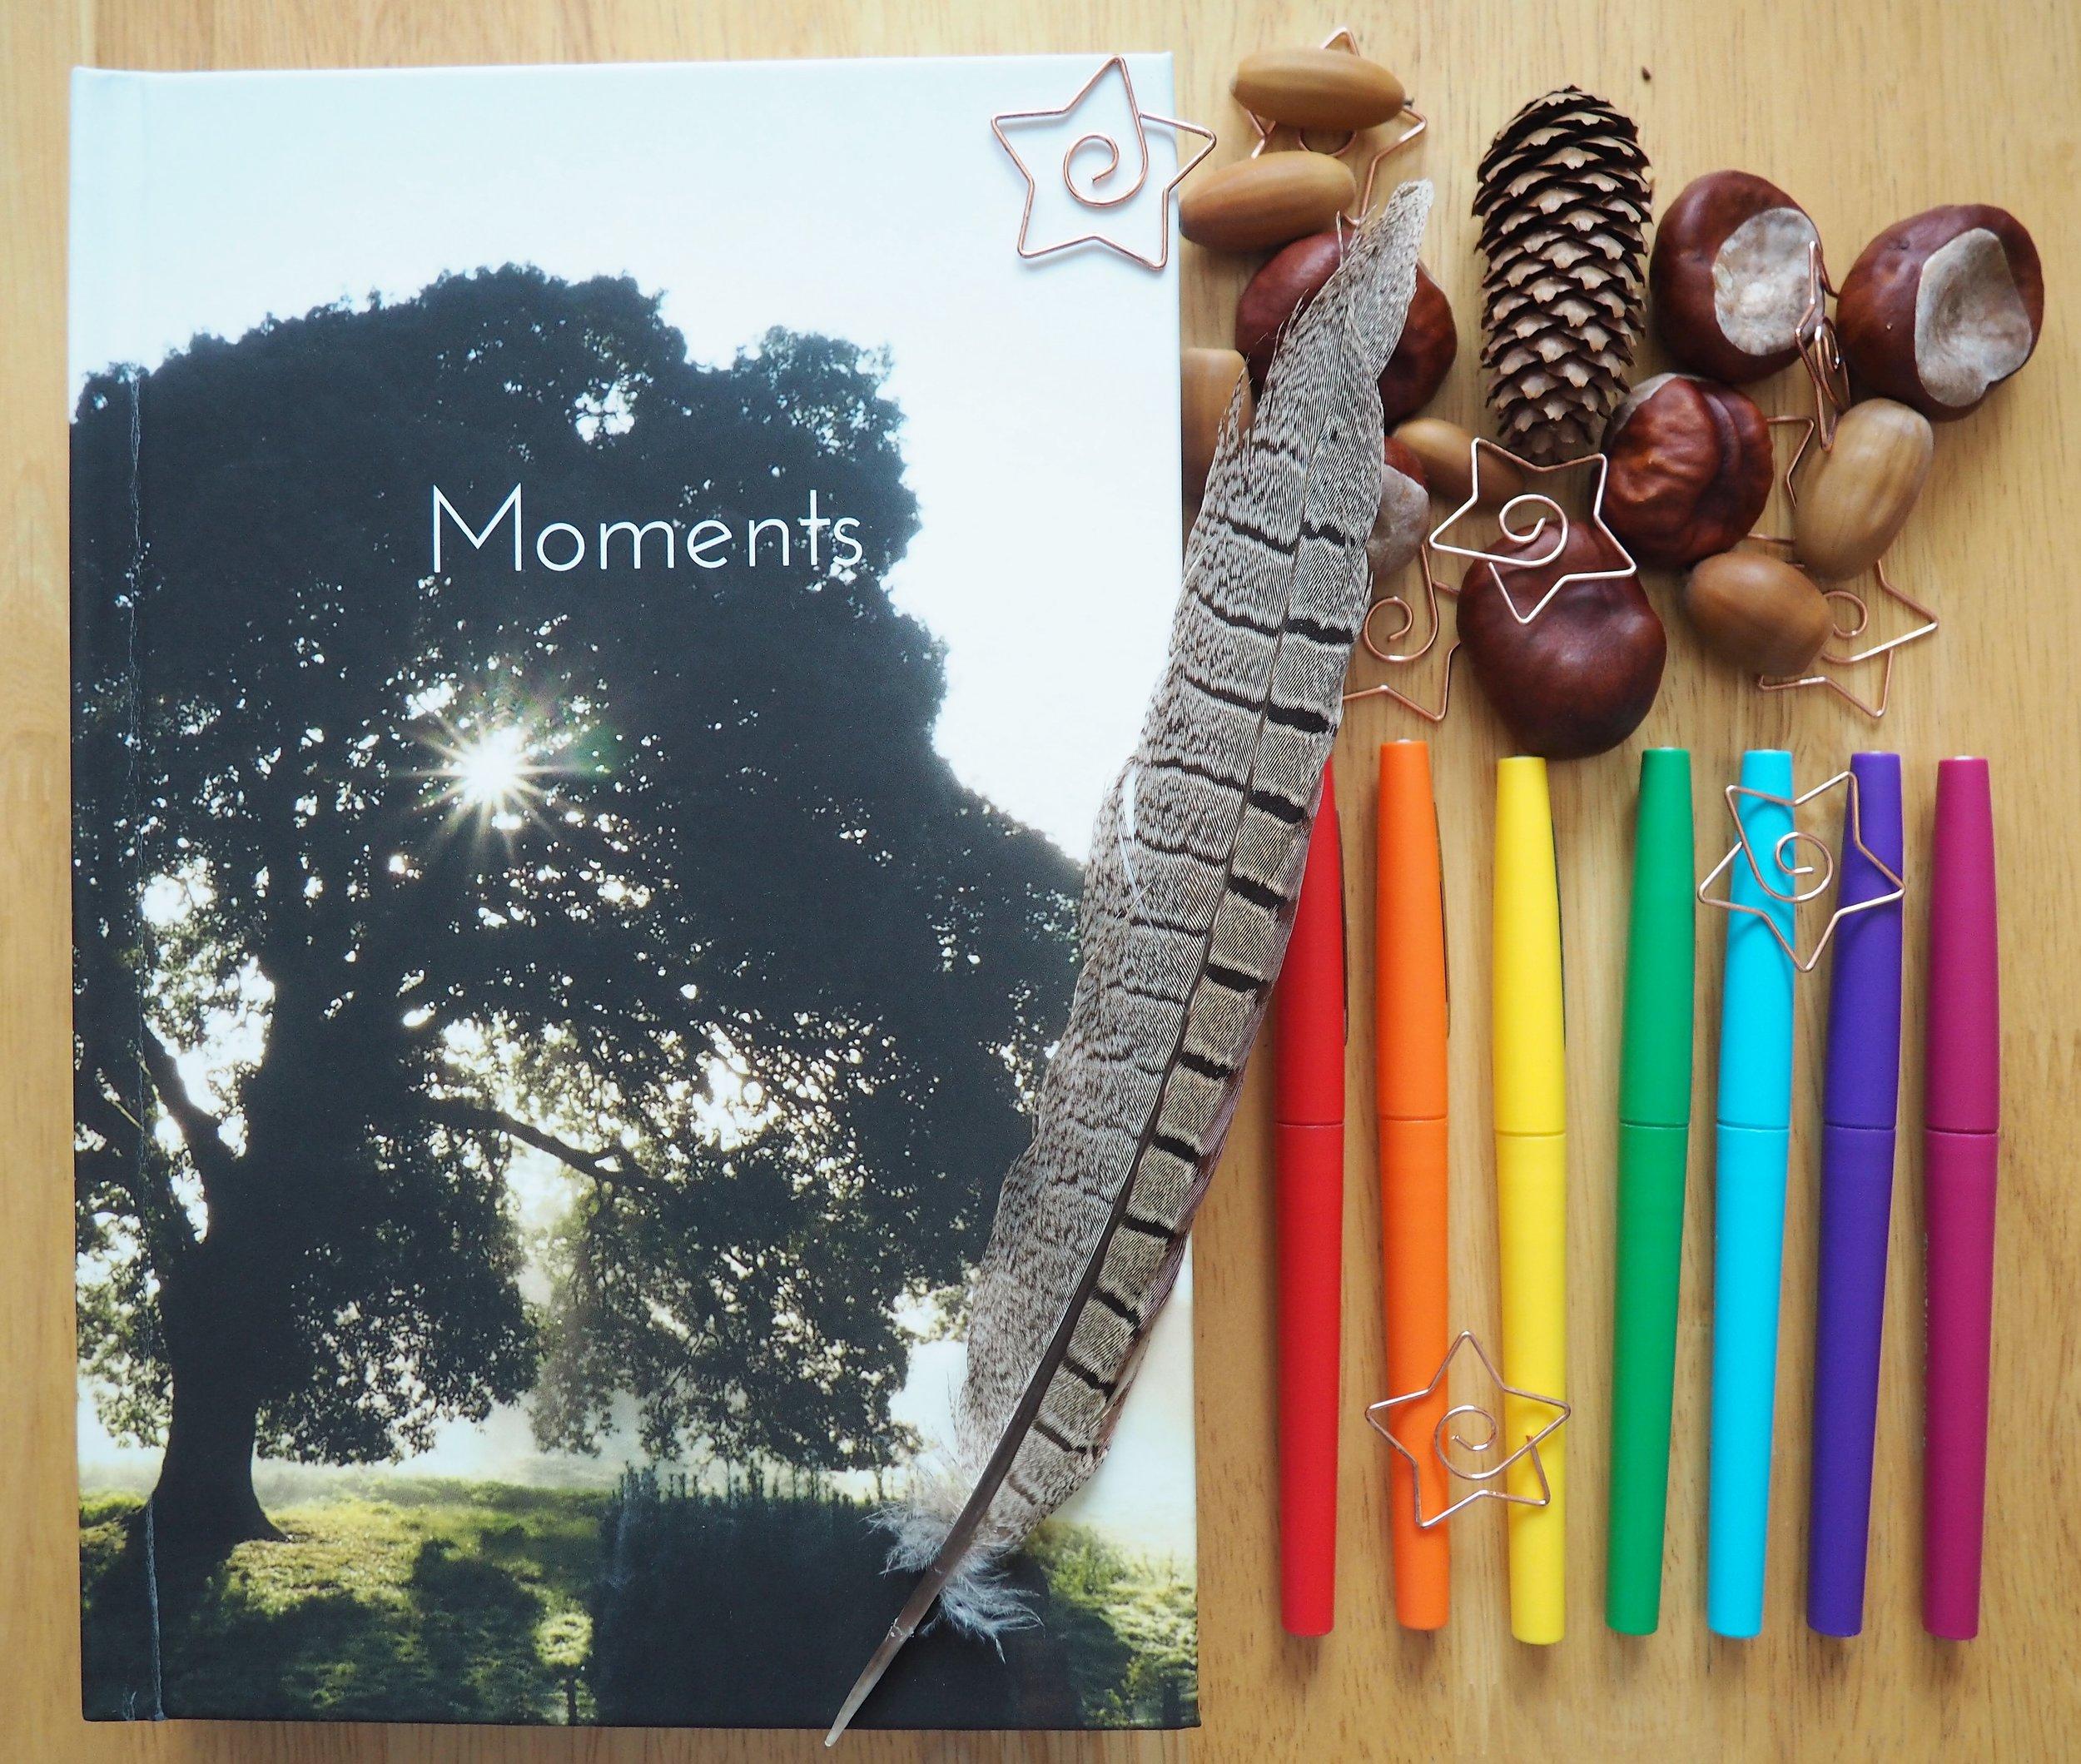 Moments Journal flatlay.JPG